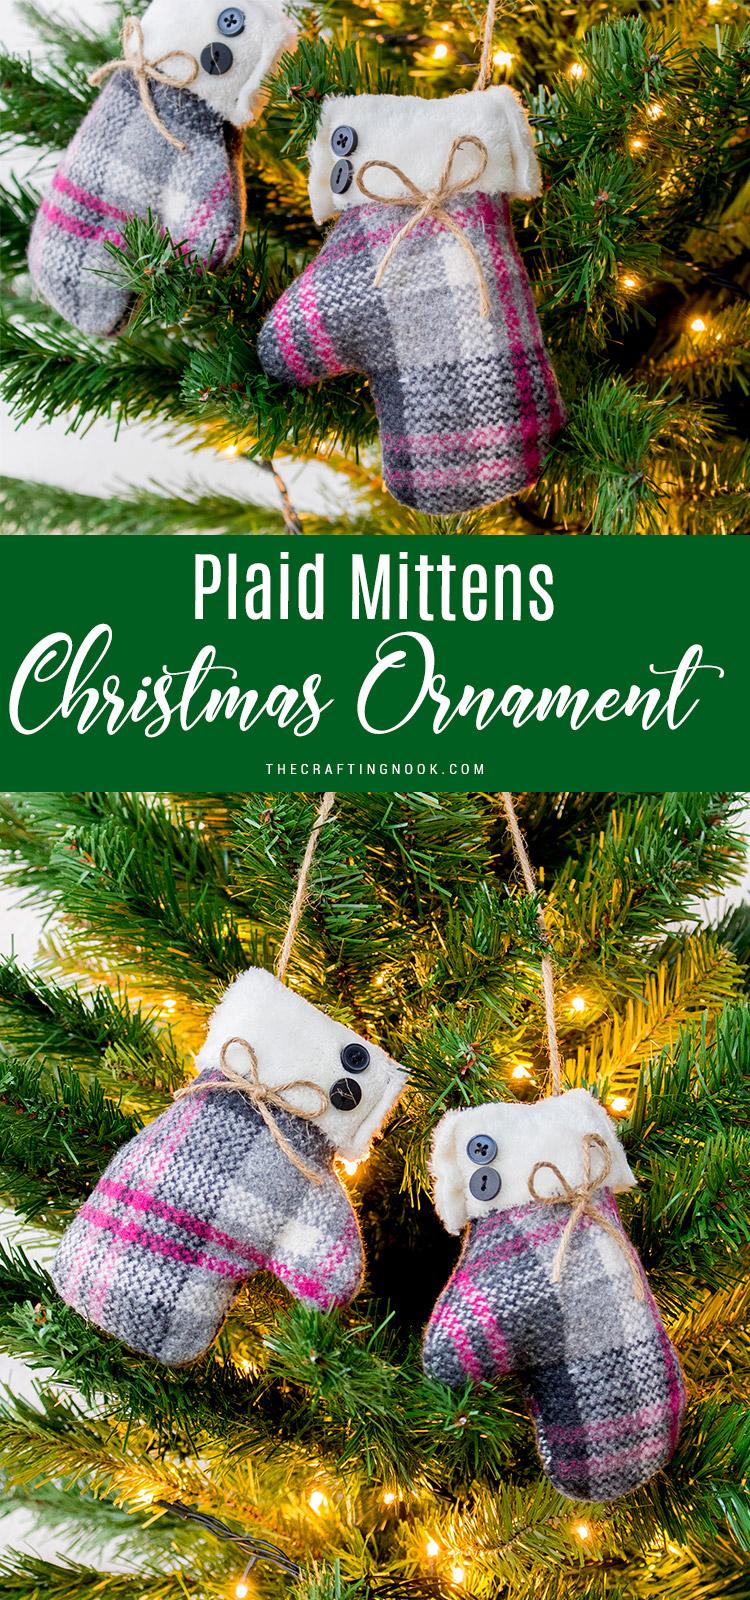 Mittens Christmas Ornament Tutorial